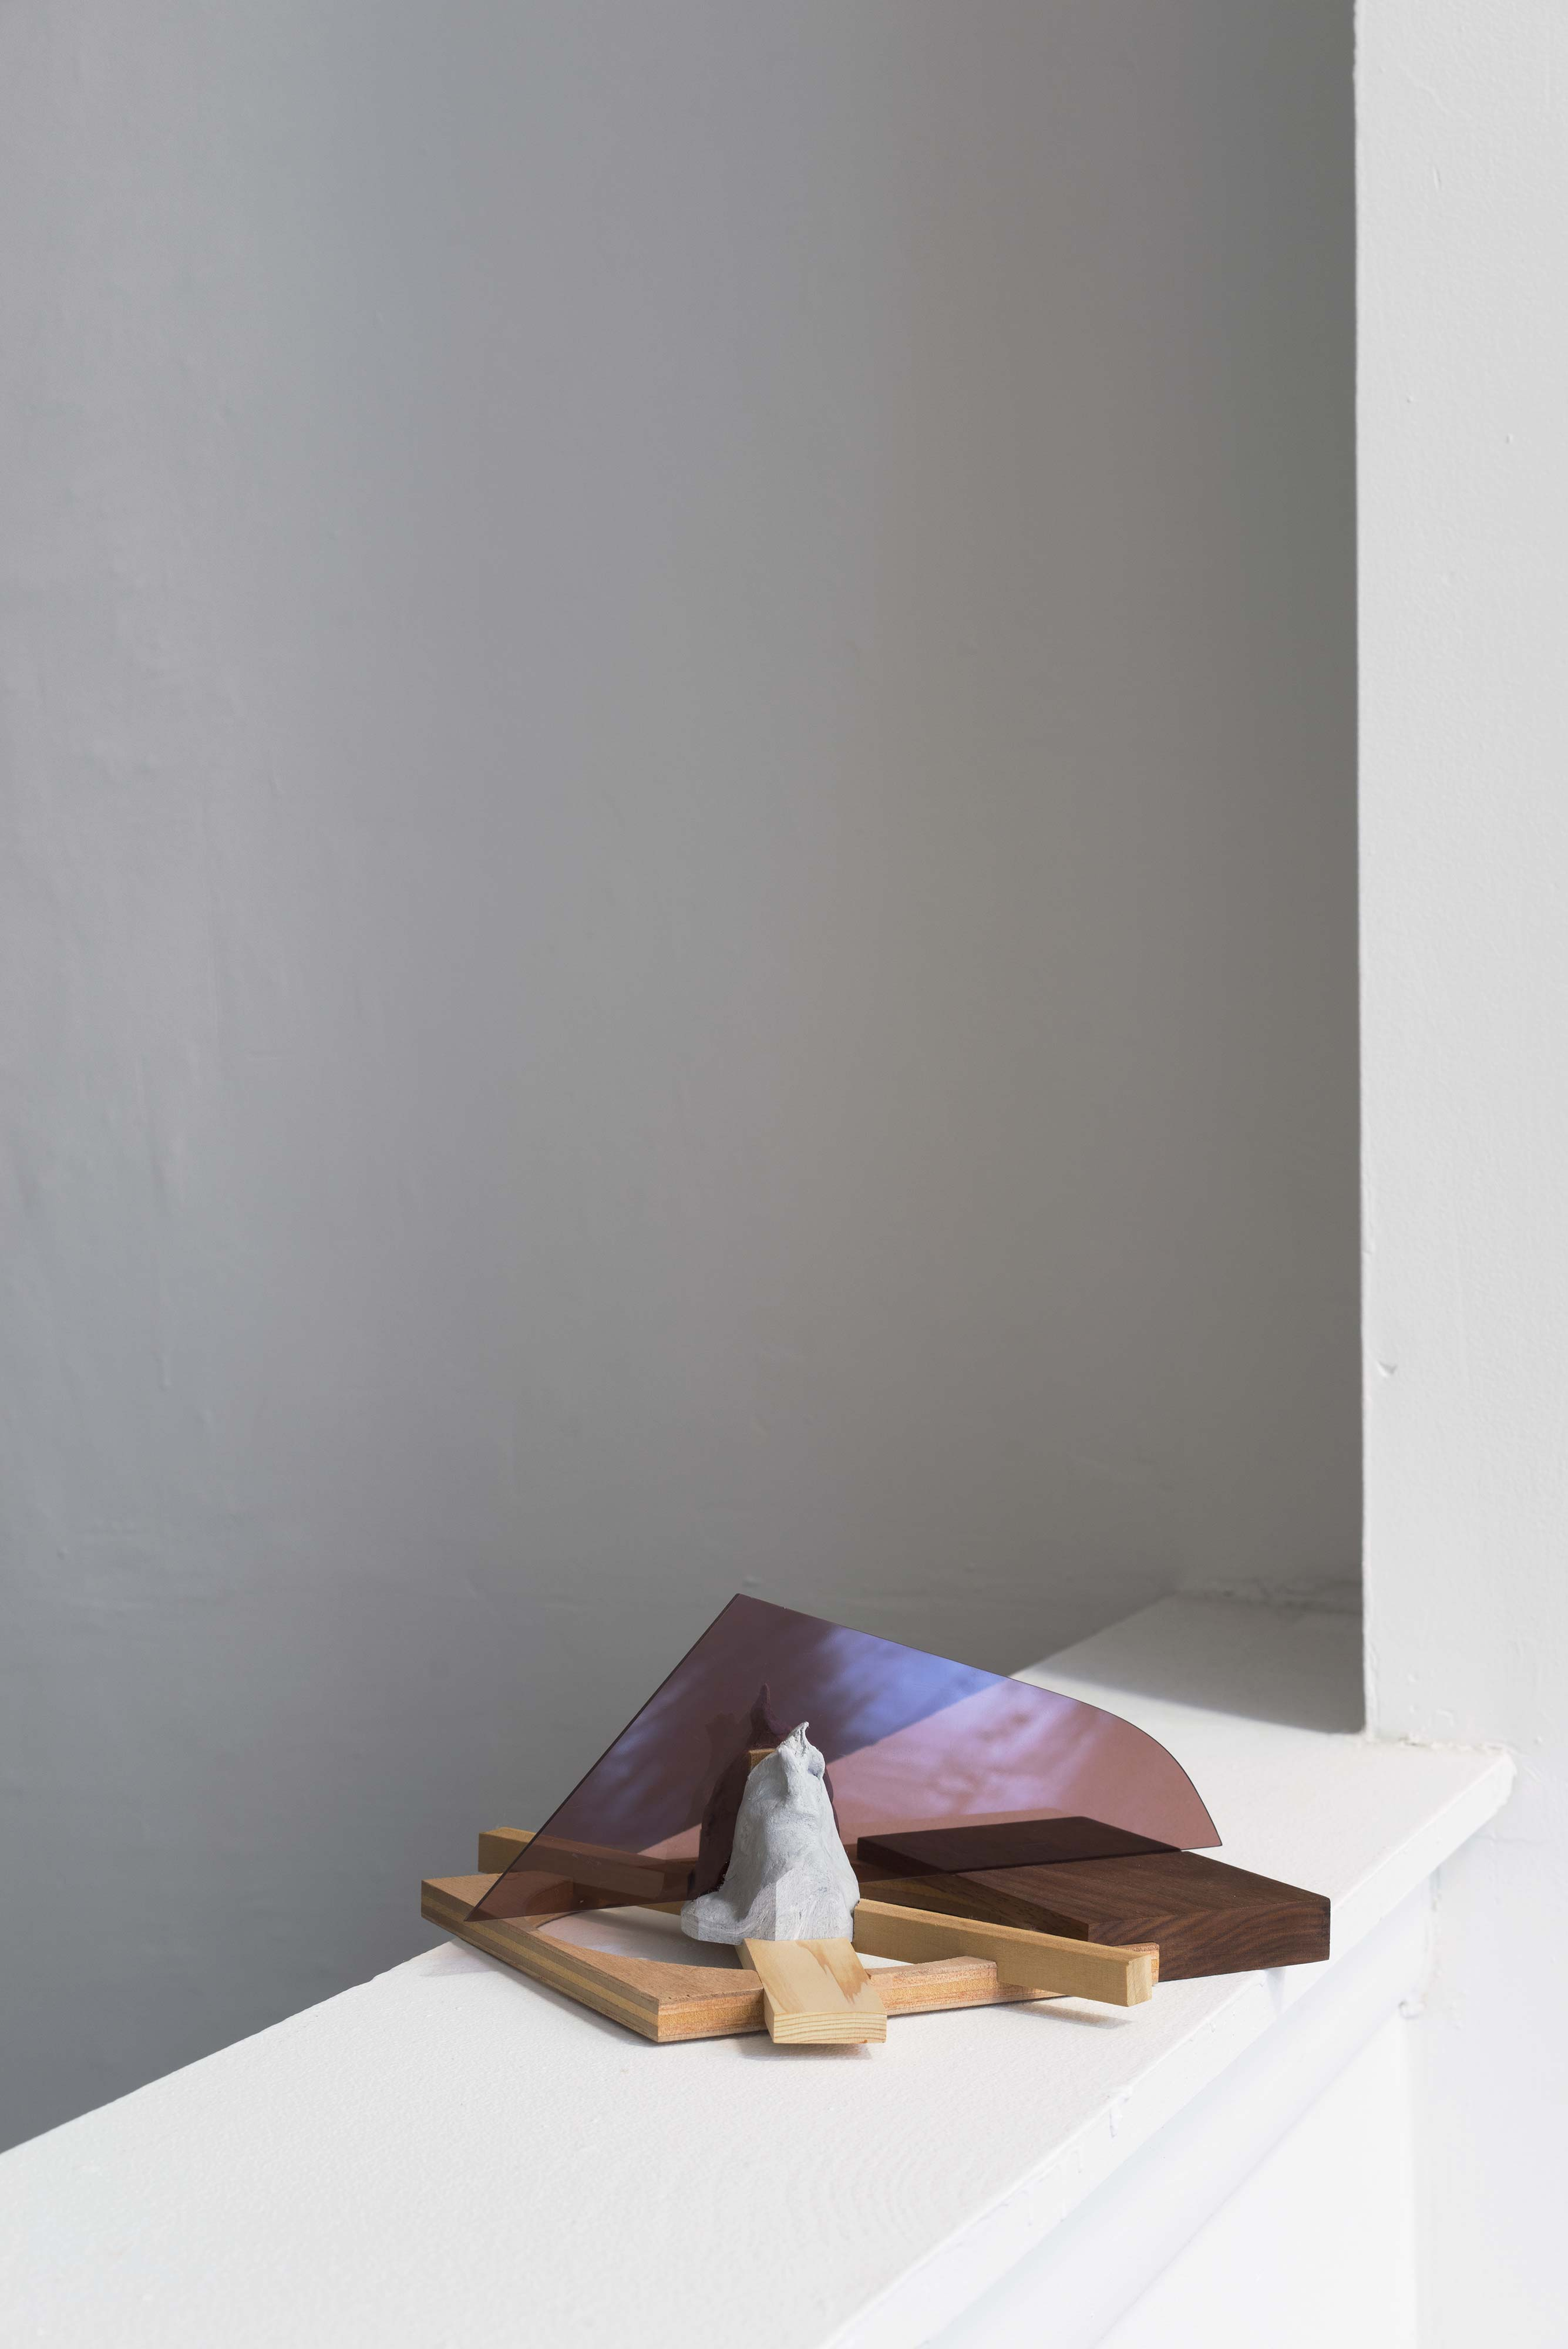 Krister Olsson<br>Campfire<br>2013<br>Wood, Acrylic, Clay<br>4.7 x 10 x 10.5 in (12 cm x 25 cm x 27 cm)